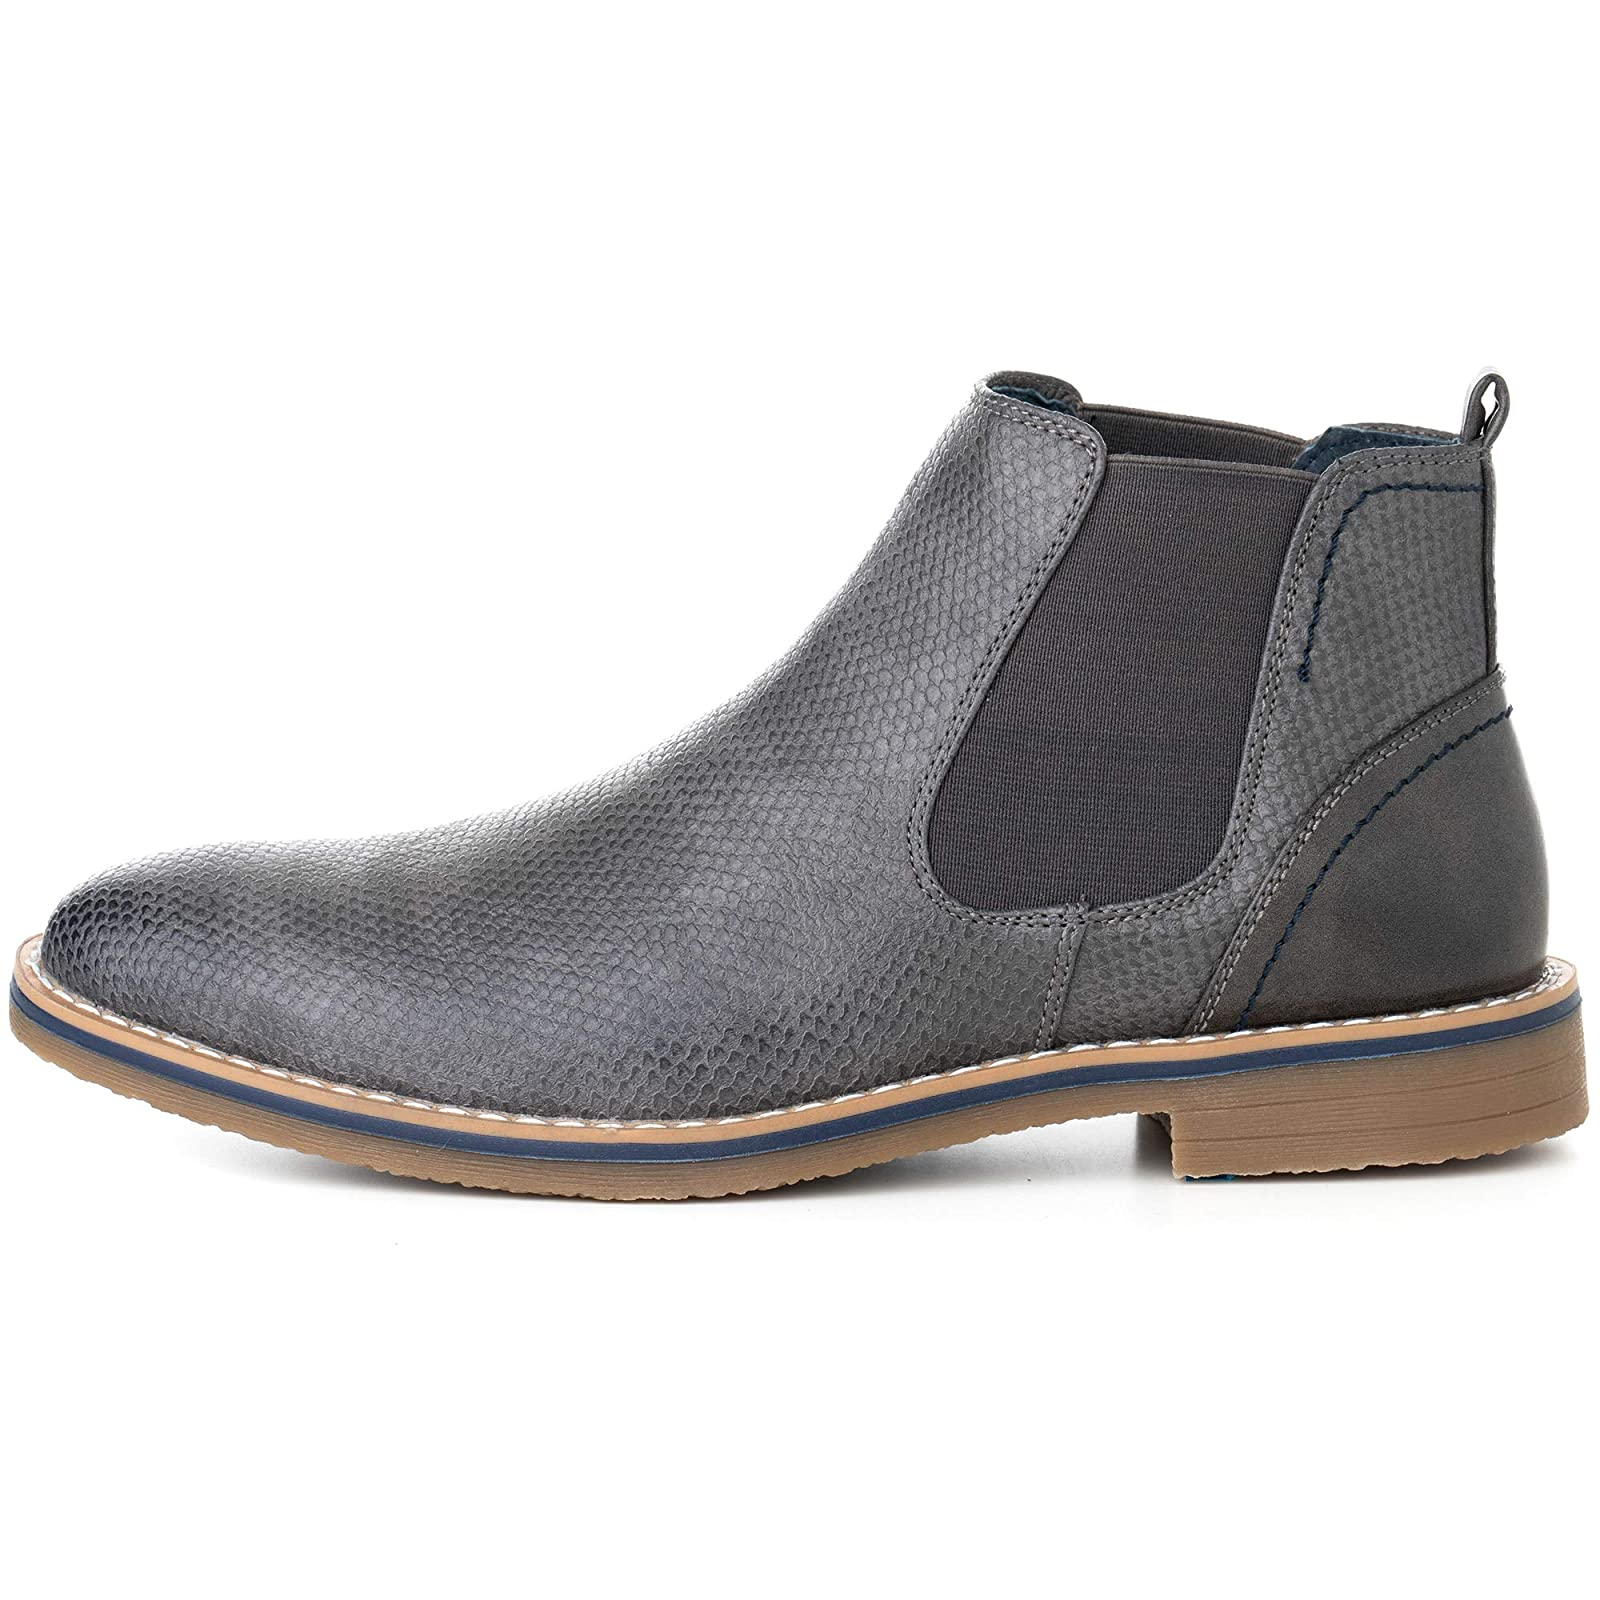 alpine swiss Men's Nash Chelsea Boots By Alpine Swiss - 4